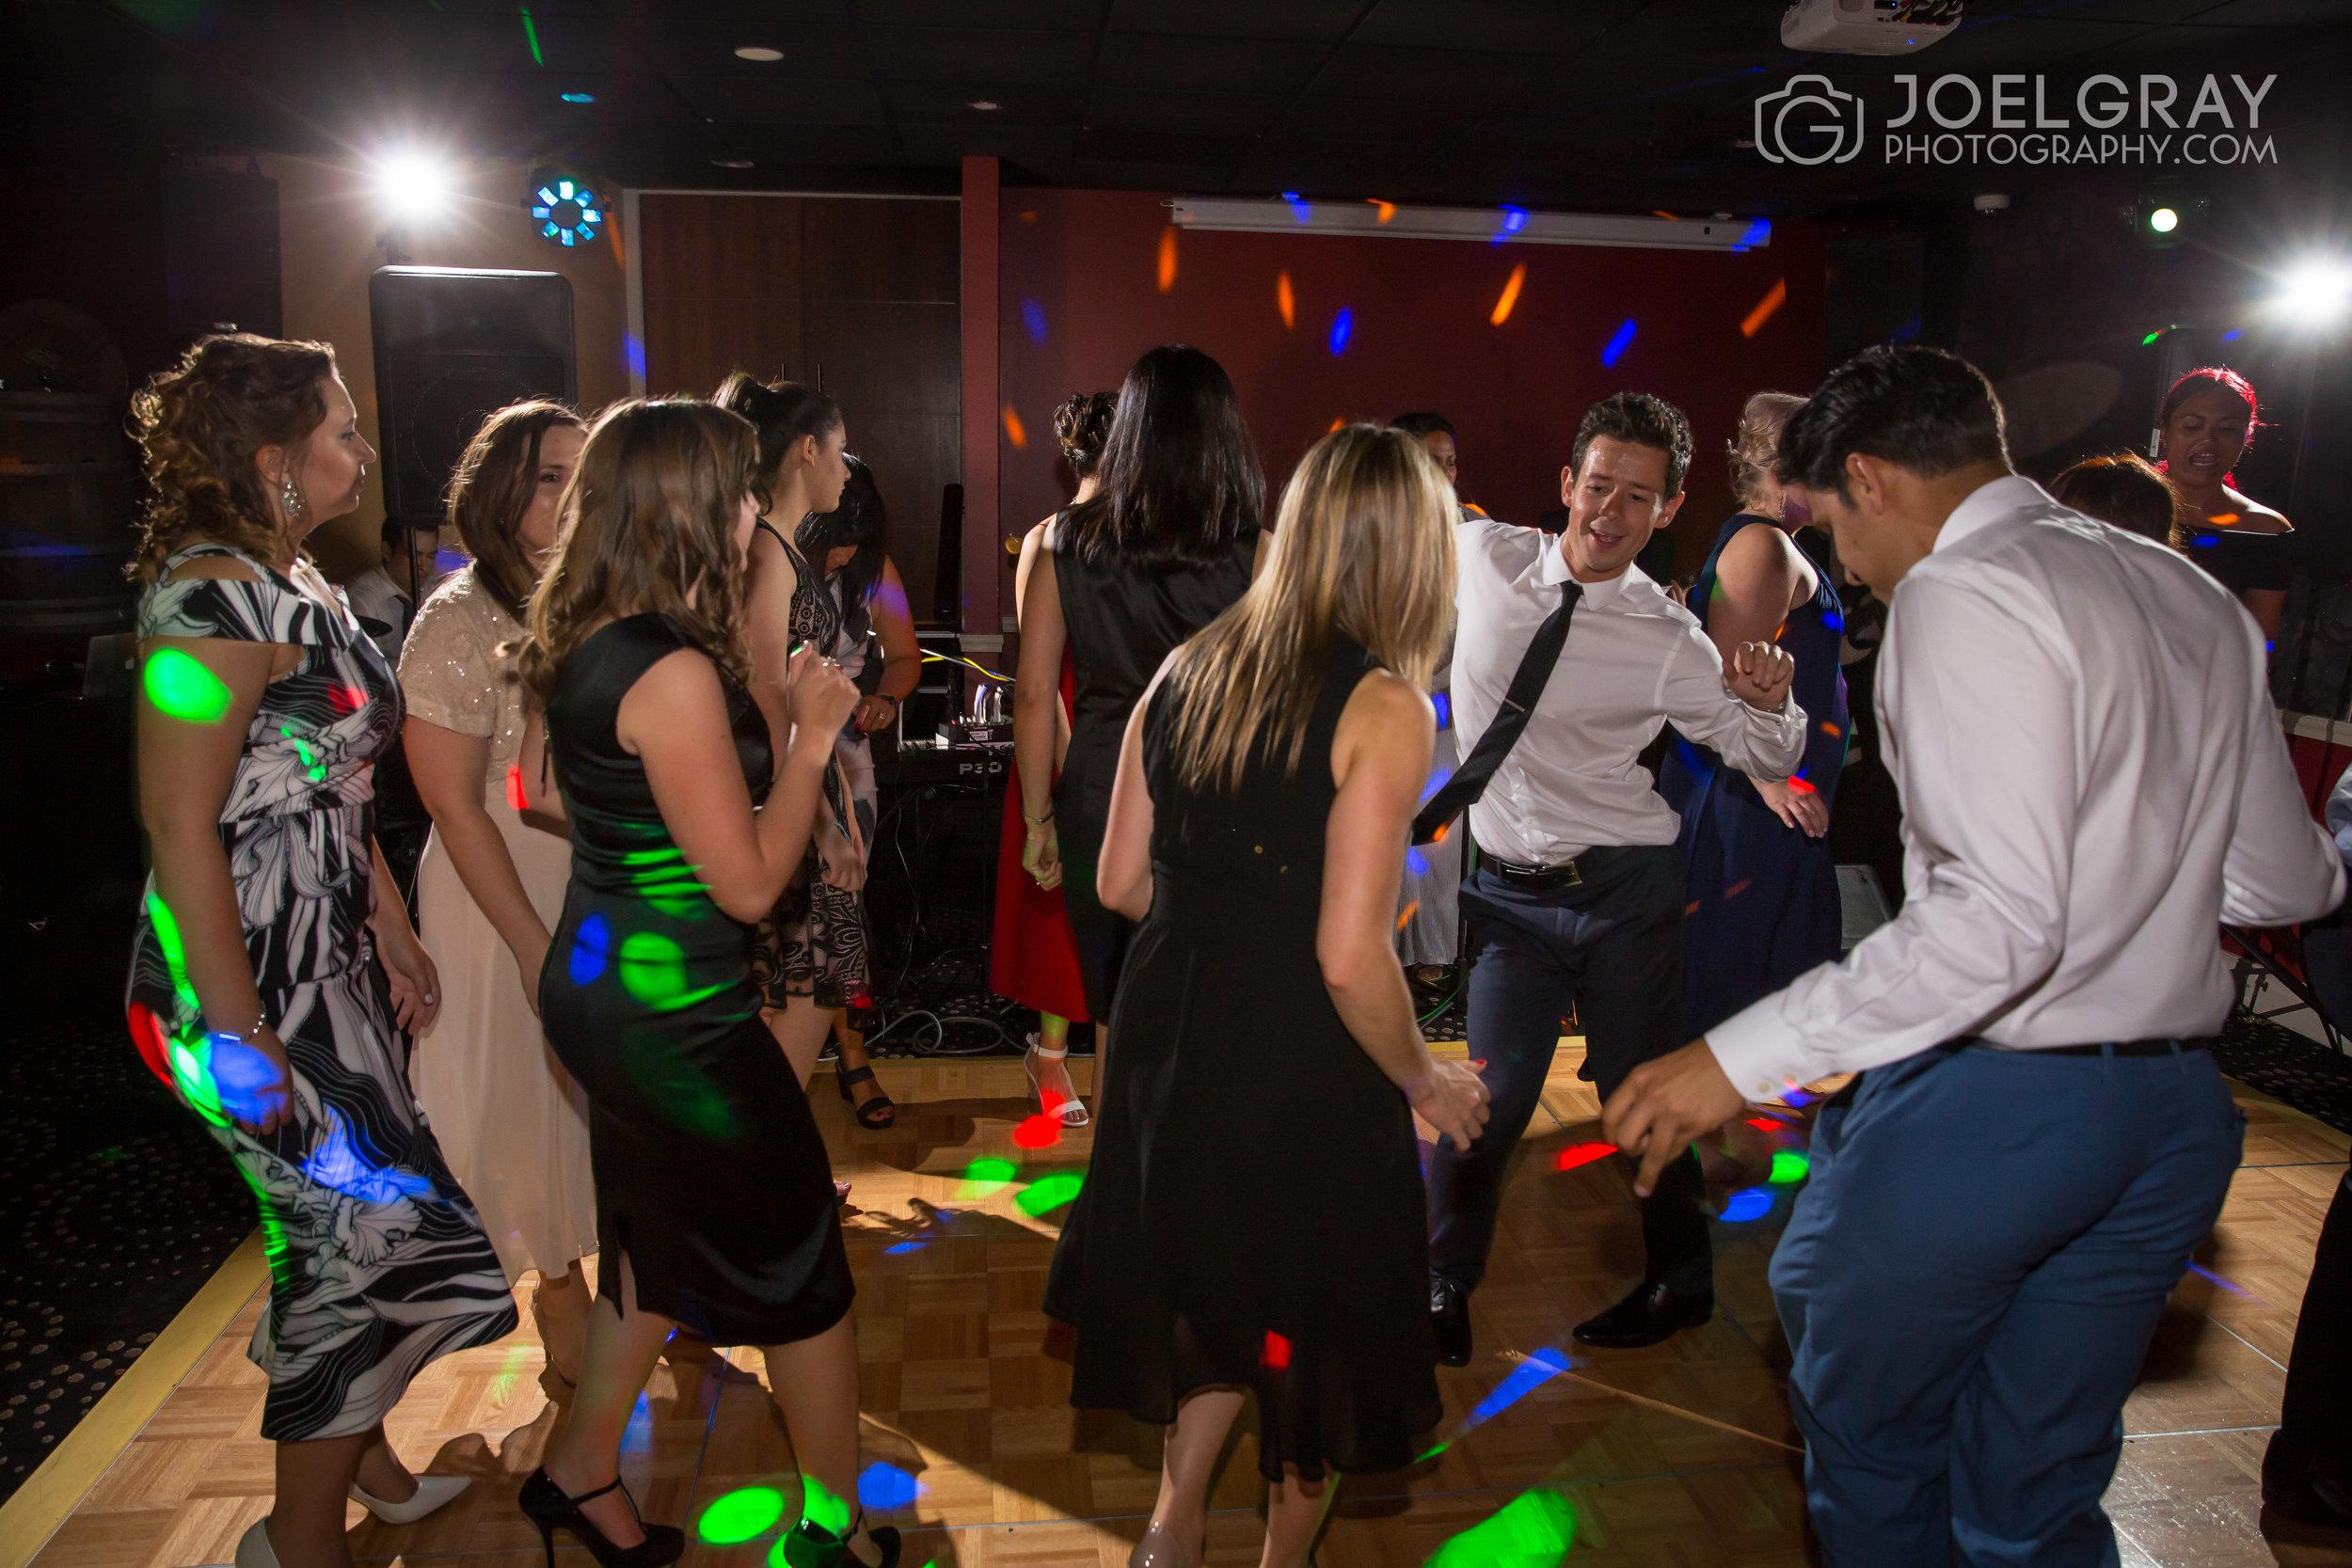 dance-floor-photographer-sydney-wedding-photography-1800829994